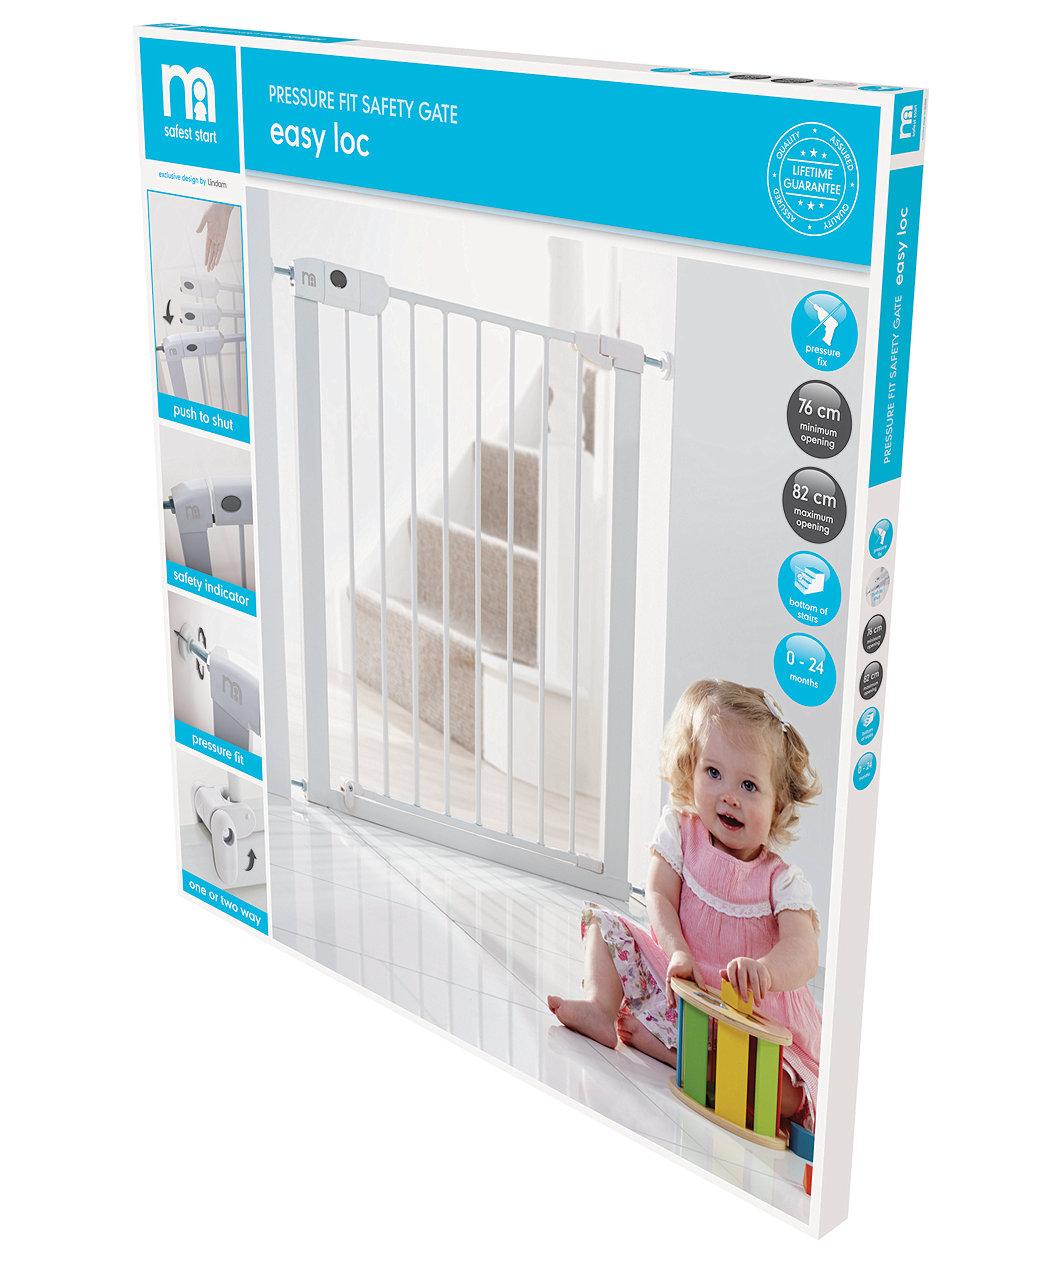 7128d3f6ac000 Mothercare Safest Start Easy Loc Pressure Fit Safety Gate